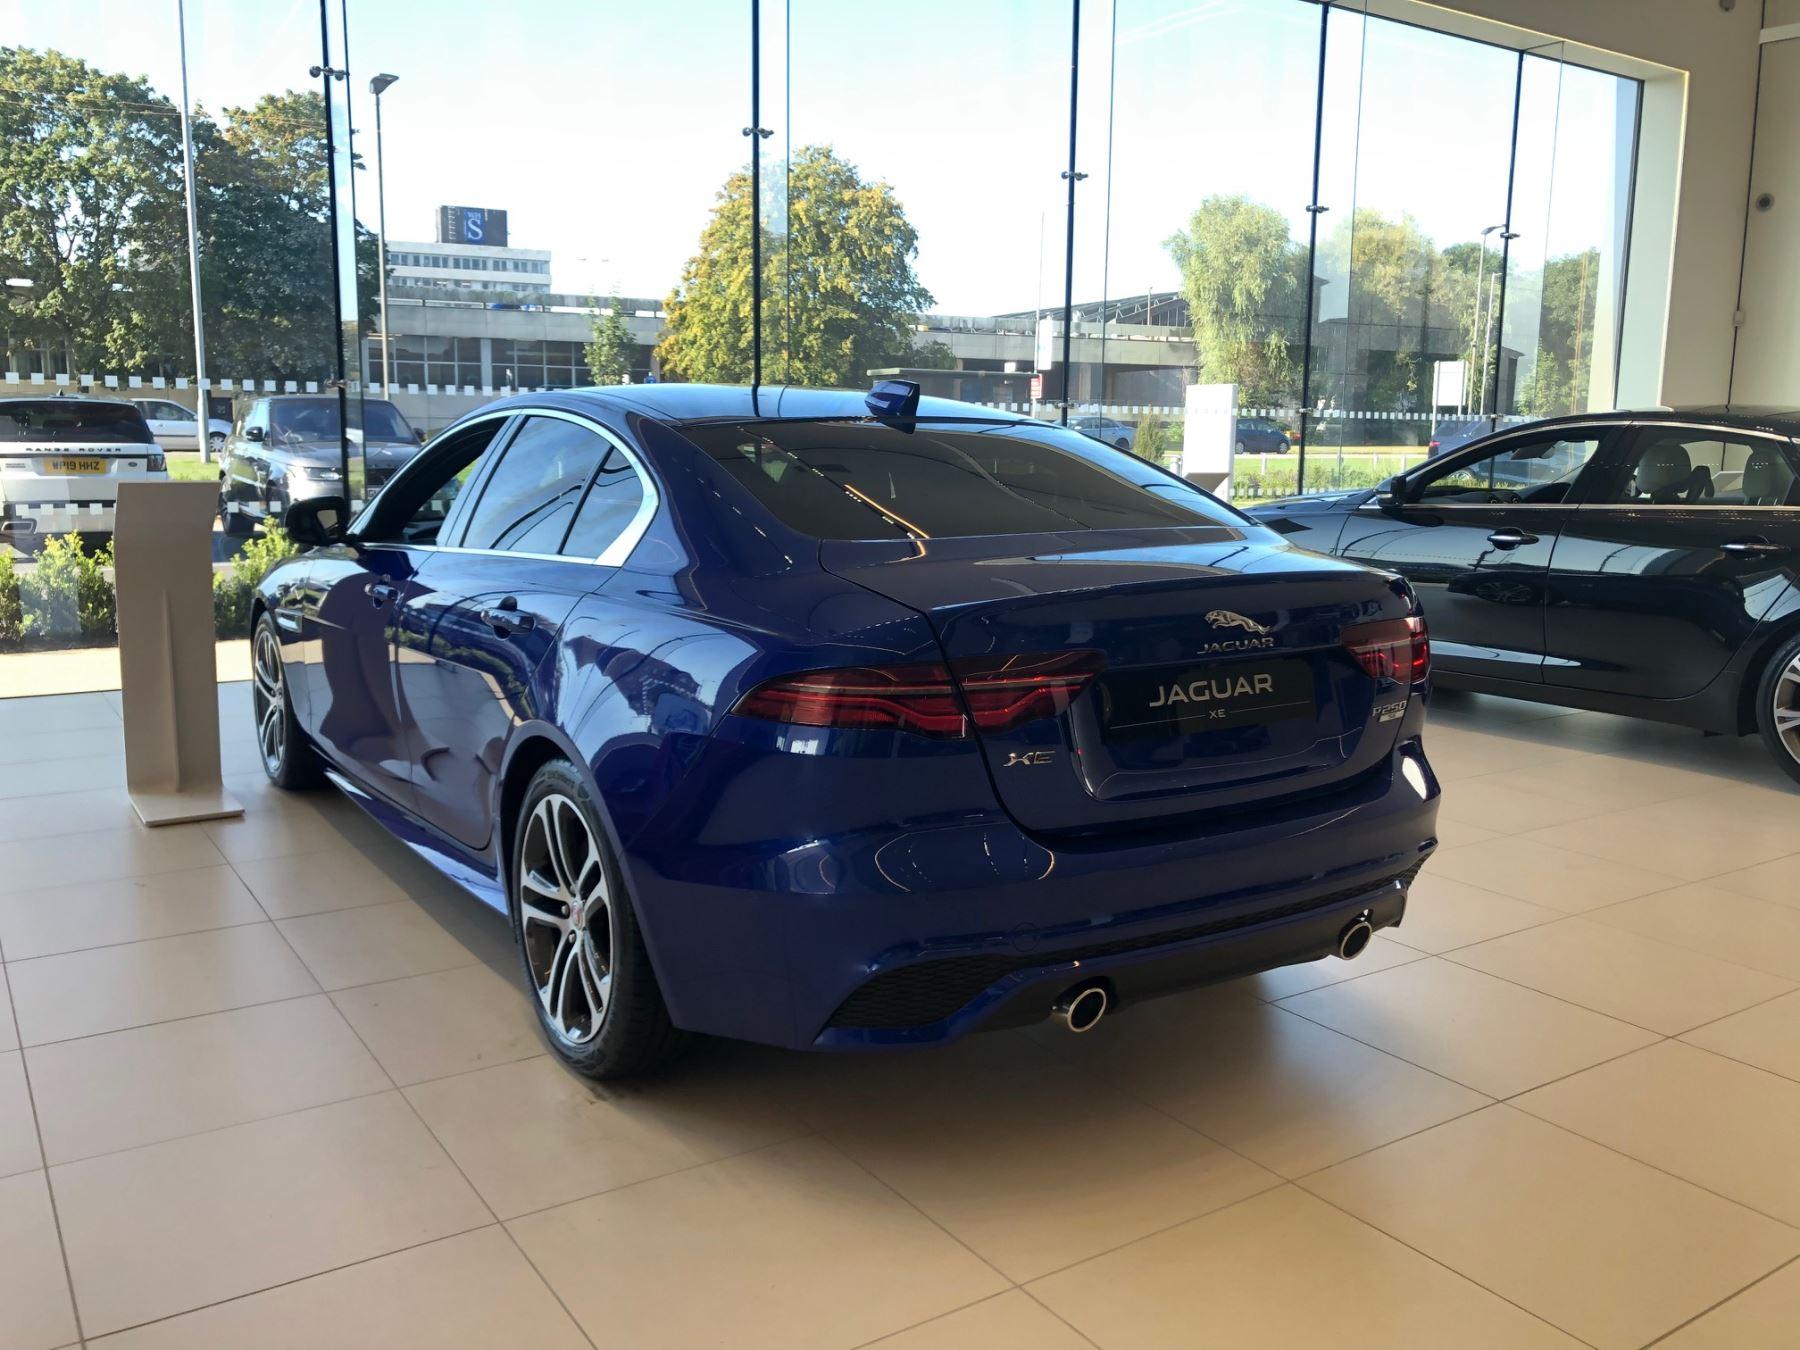 Jaguar XE 2.0 R-Dynamic SE image 2